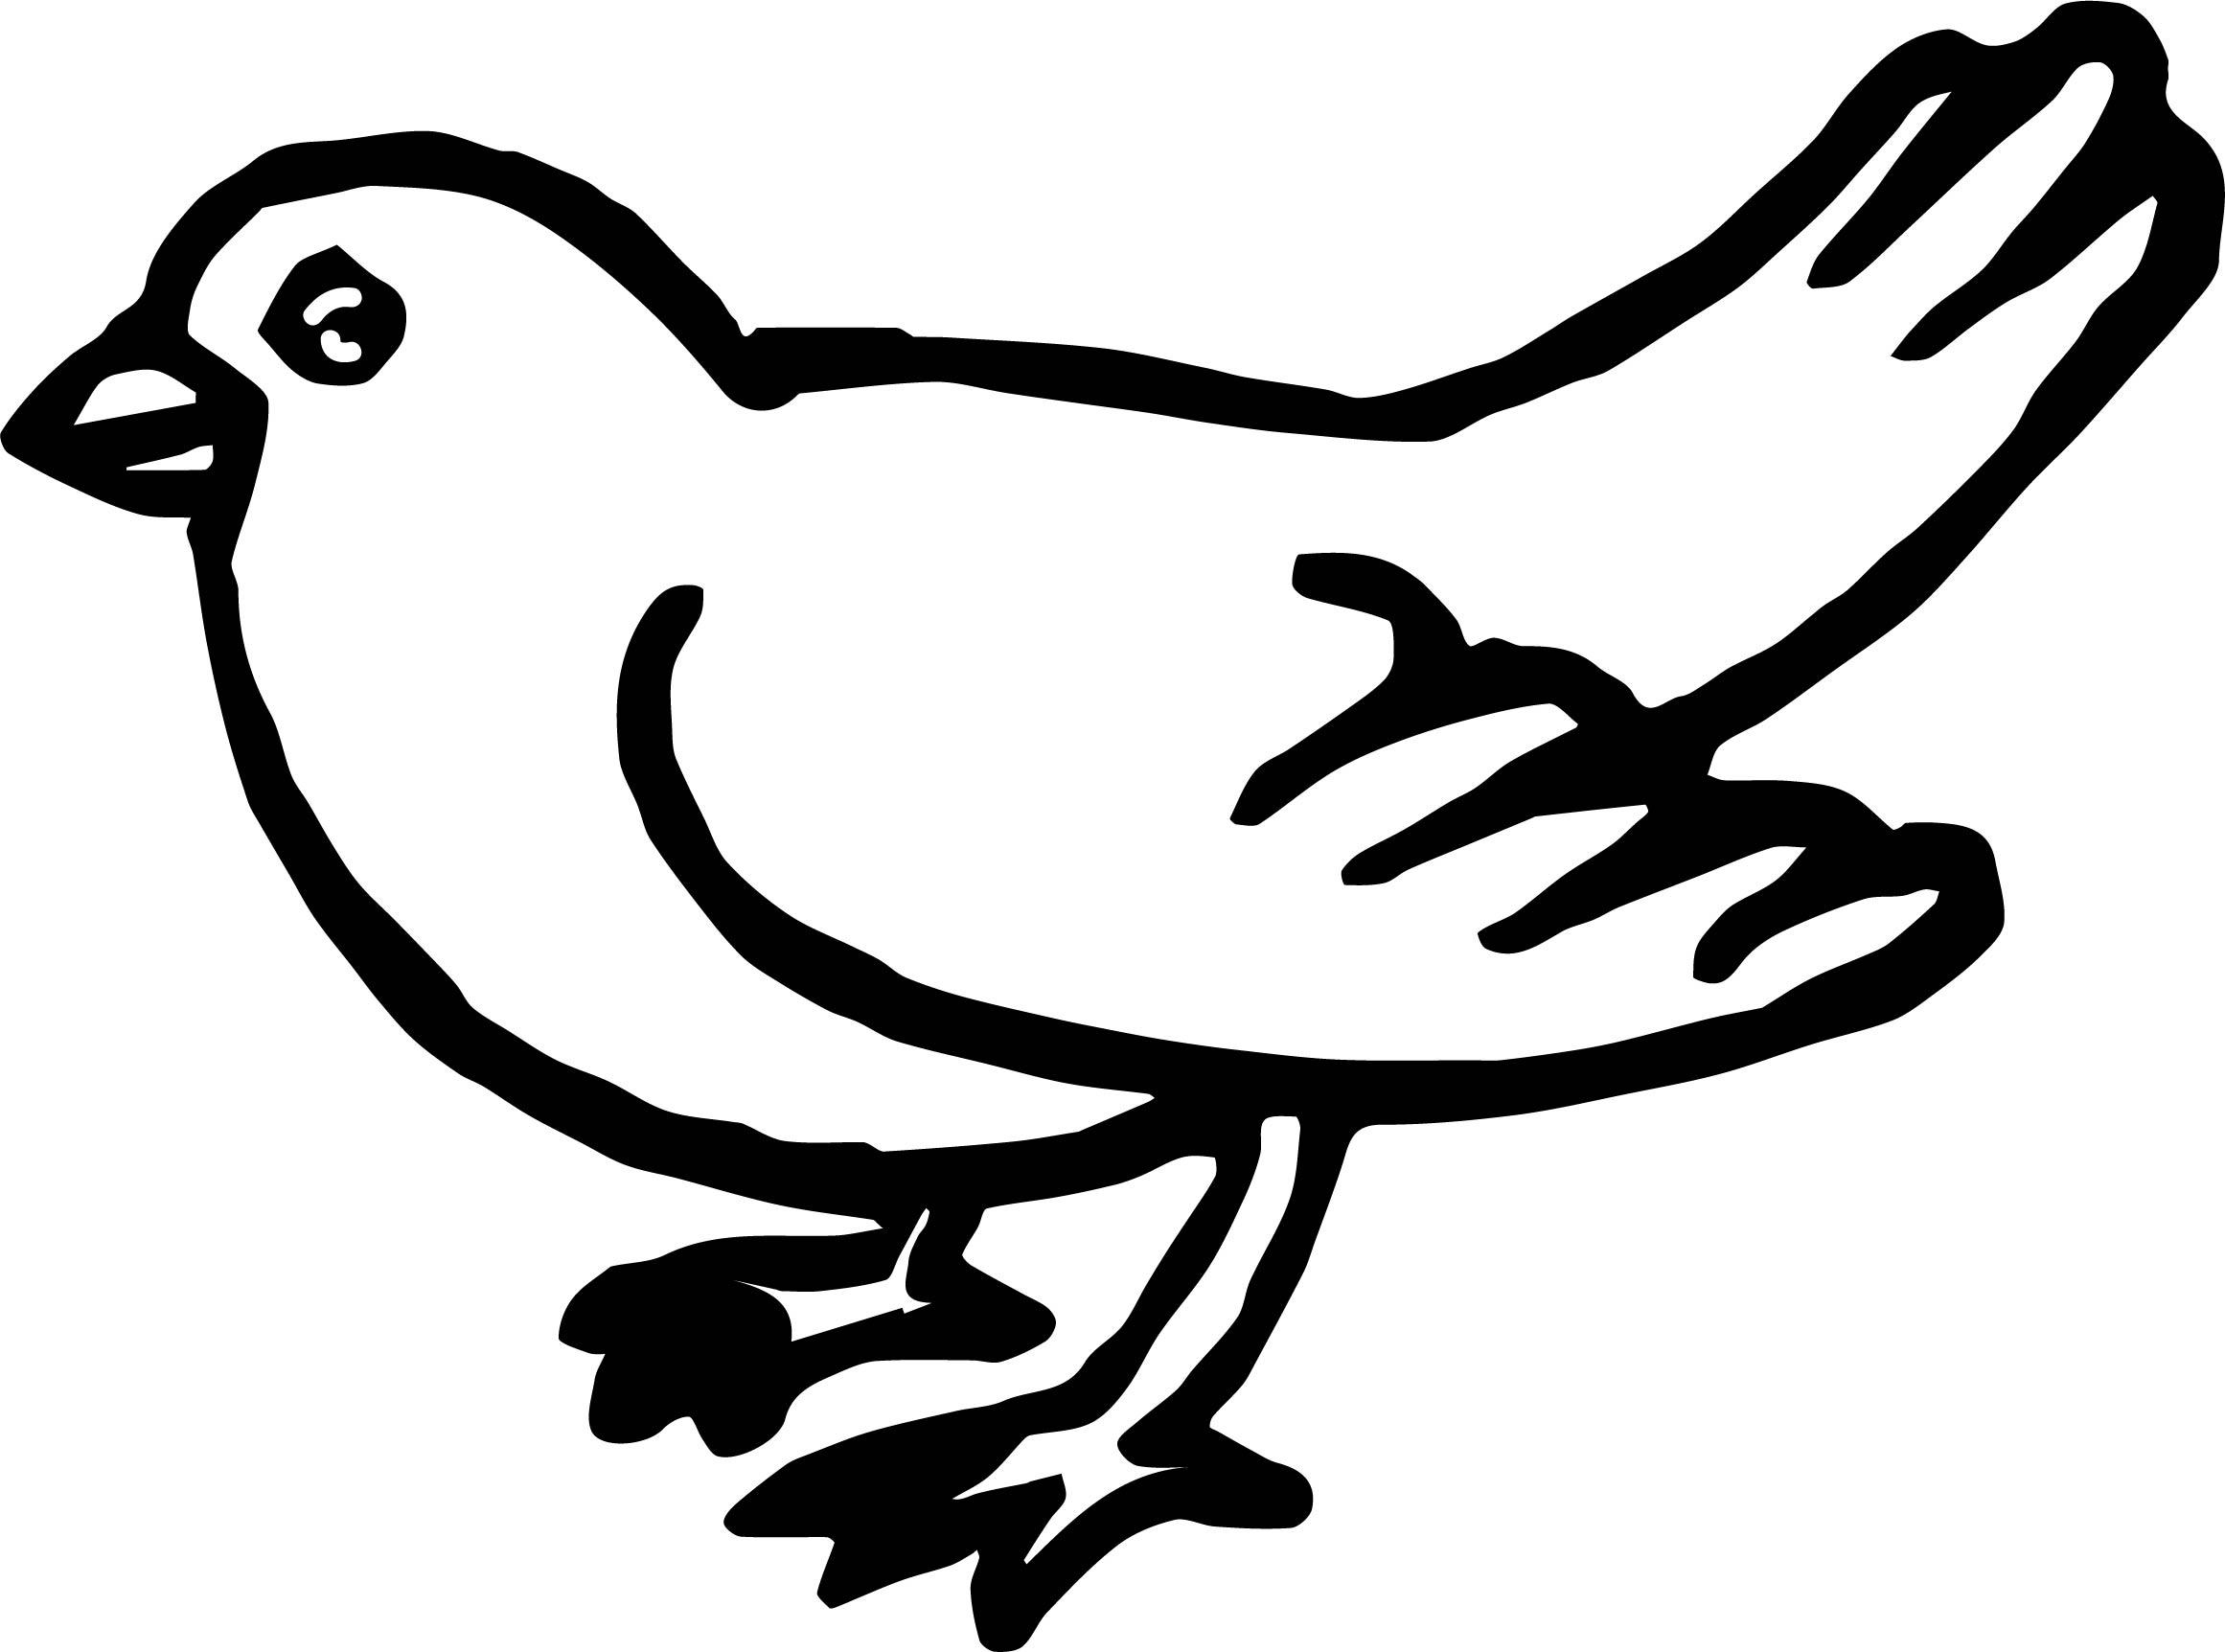 His Bird Coloring Page